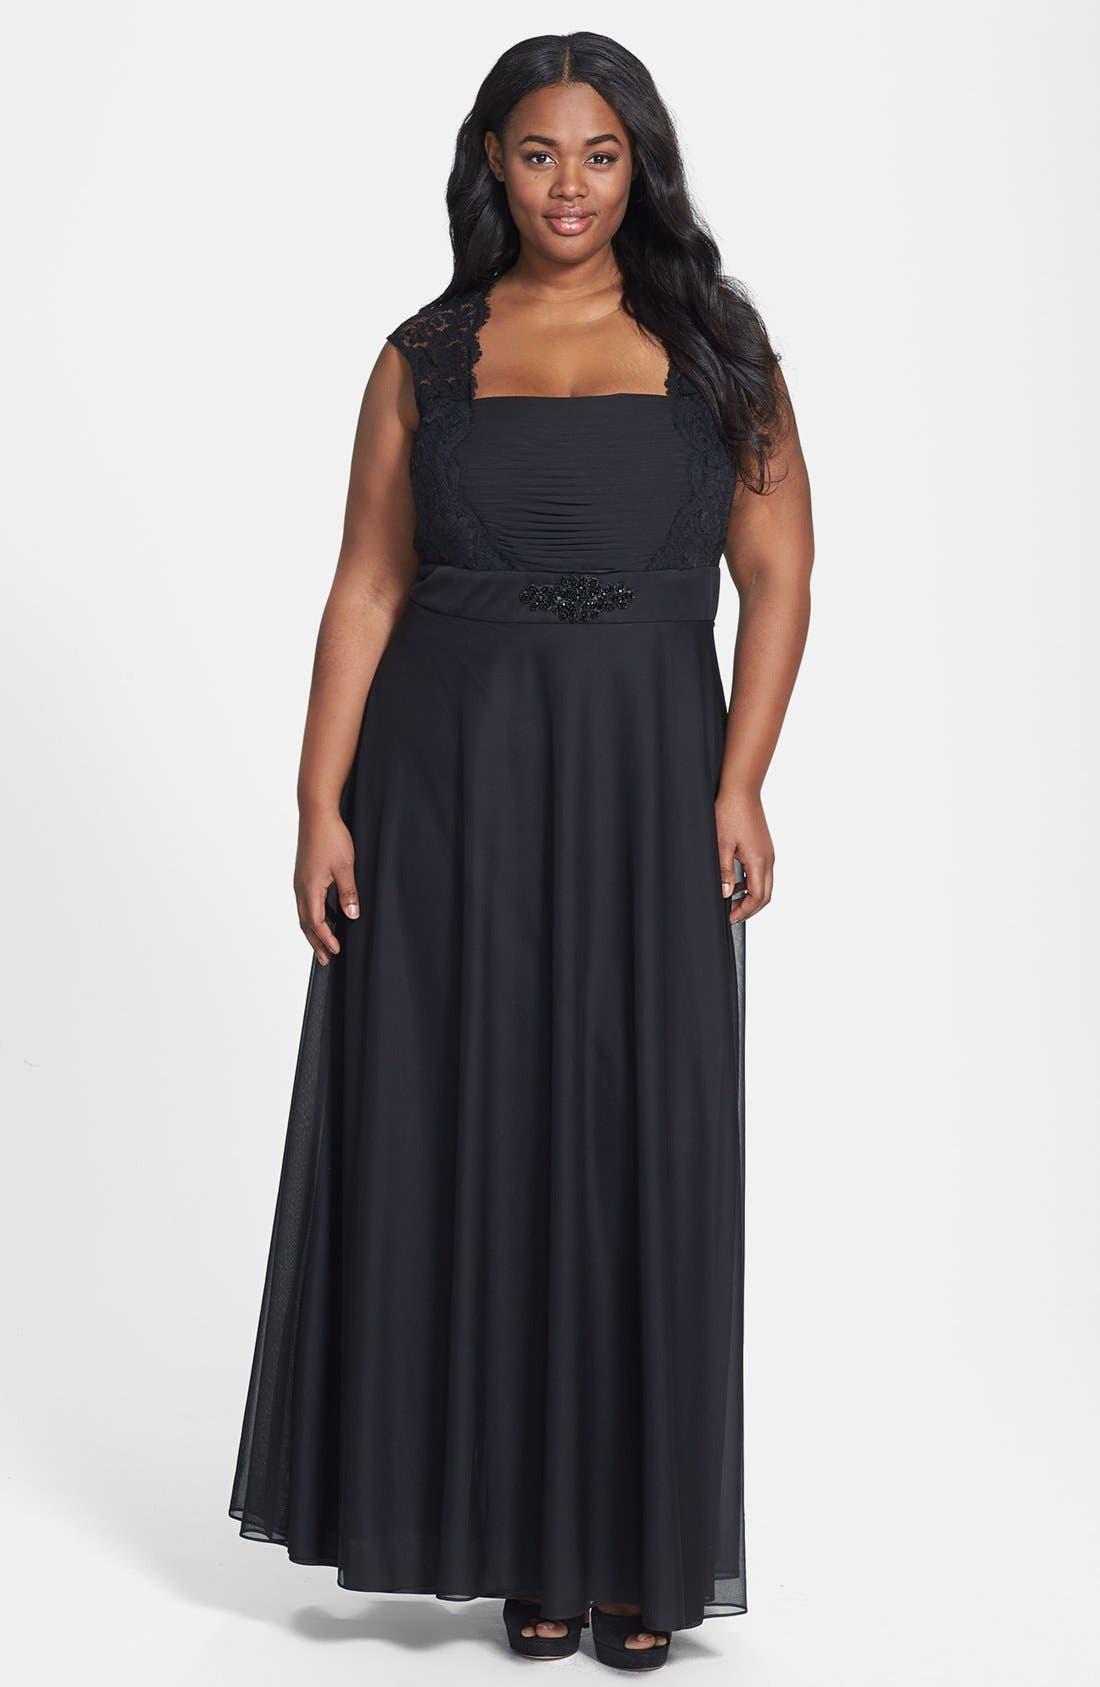 Alternate Image 1 Selected - Xscape Embellished Chiffon & Knit Gown (Plus Size)